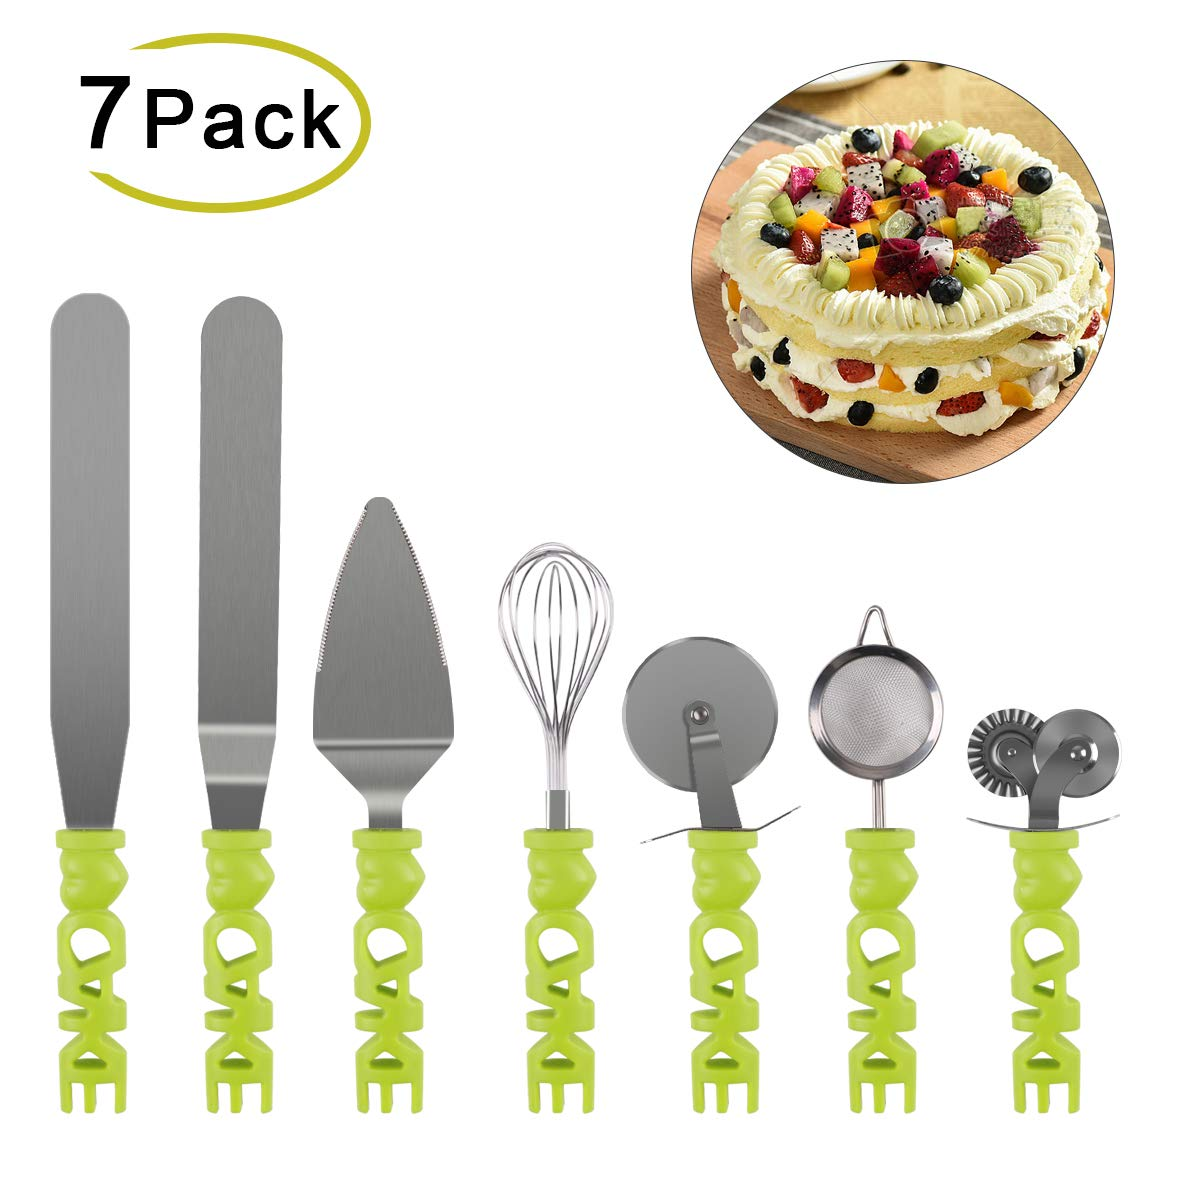 7 Pcs Baking Tool Kit Stainless Steel Cake Tool Kit Baking Utensil Set with Pizza Cutter, Spatula Turners, Egg Whisk, Cake Shovel and Flour Sieve